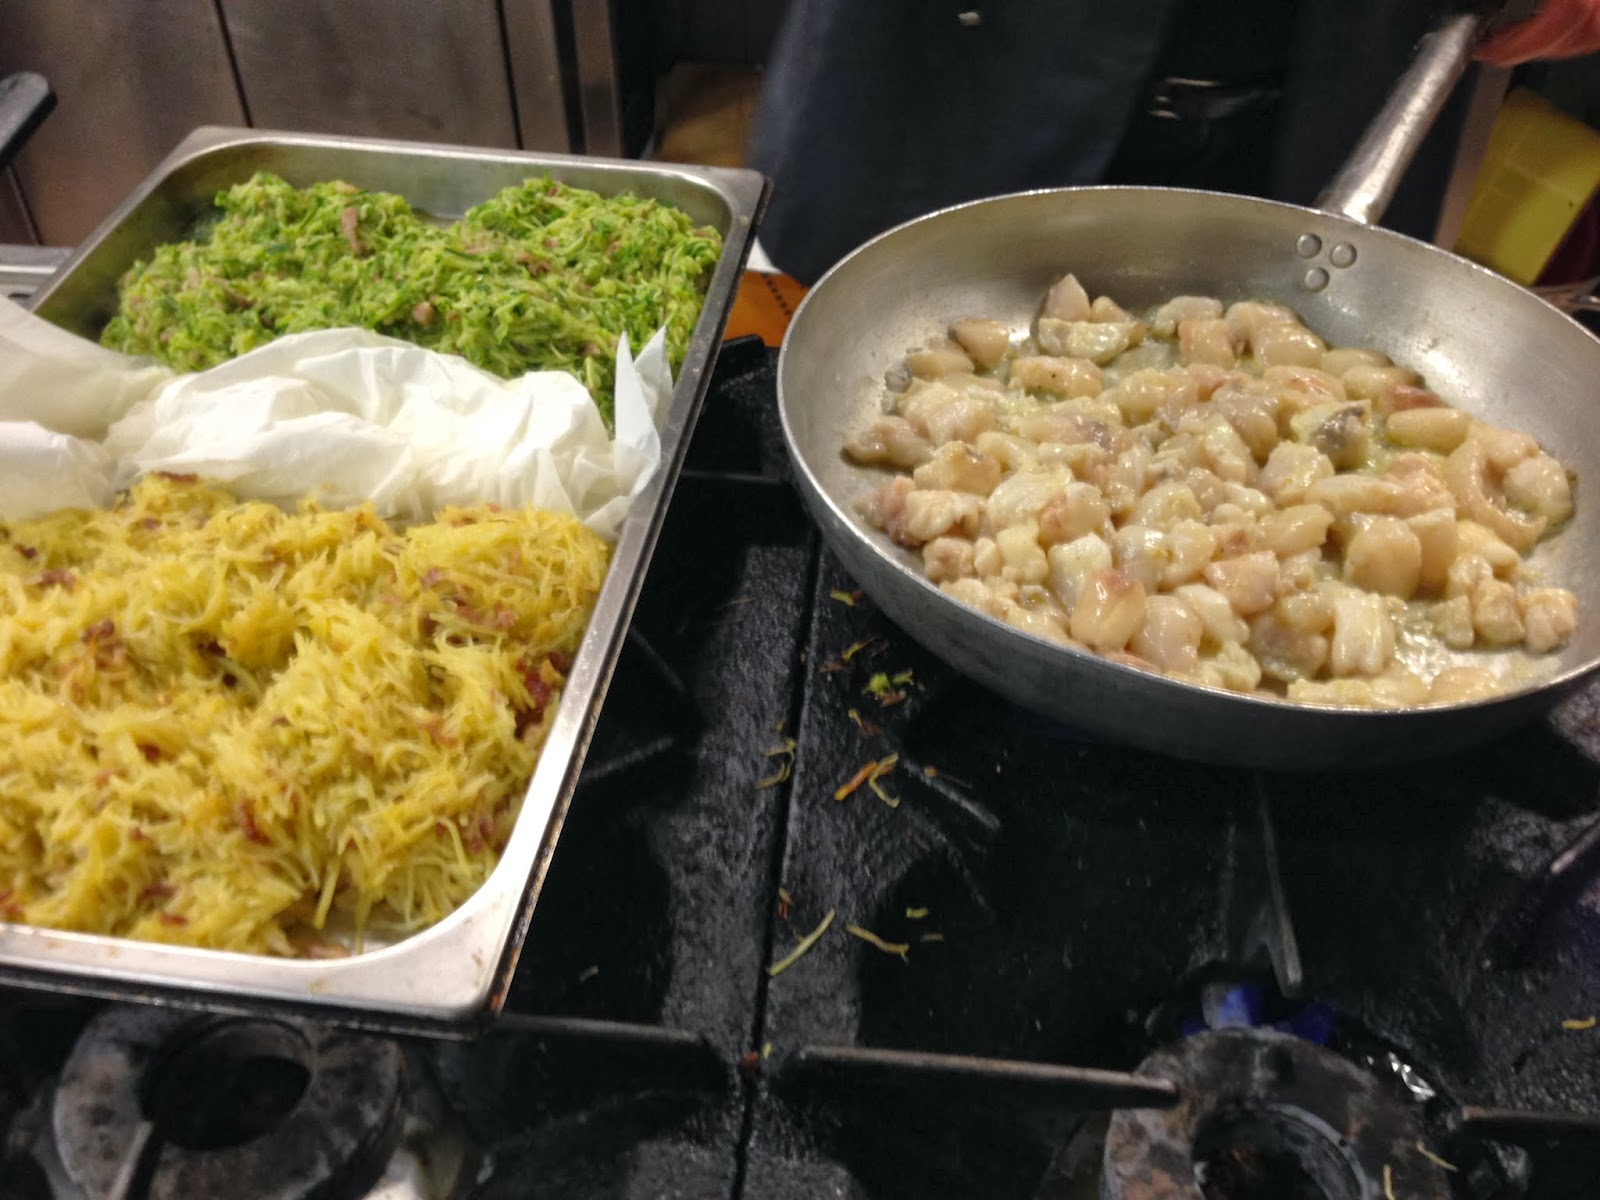 Vino cucina ingegneria 36 cucina piadina con coda di for Verdure alla julienne